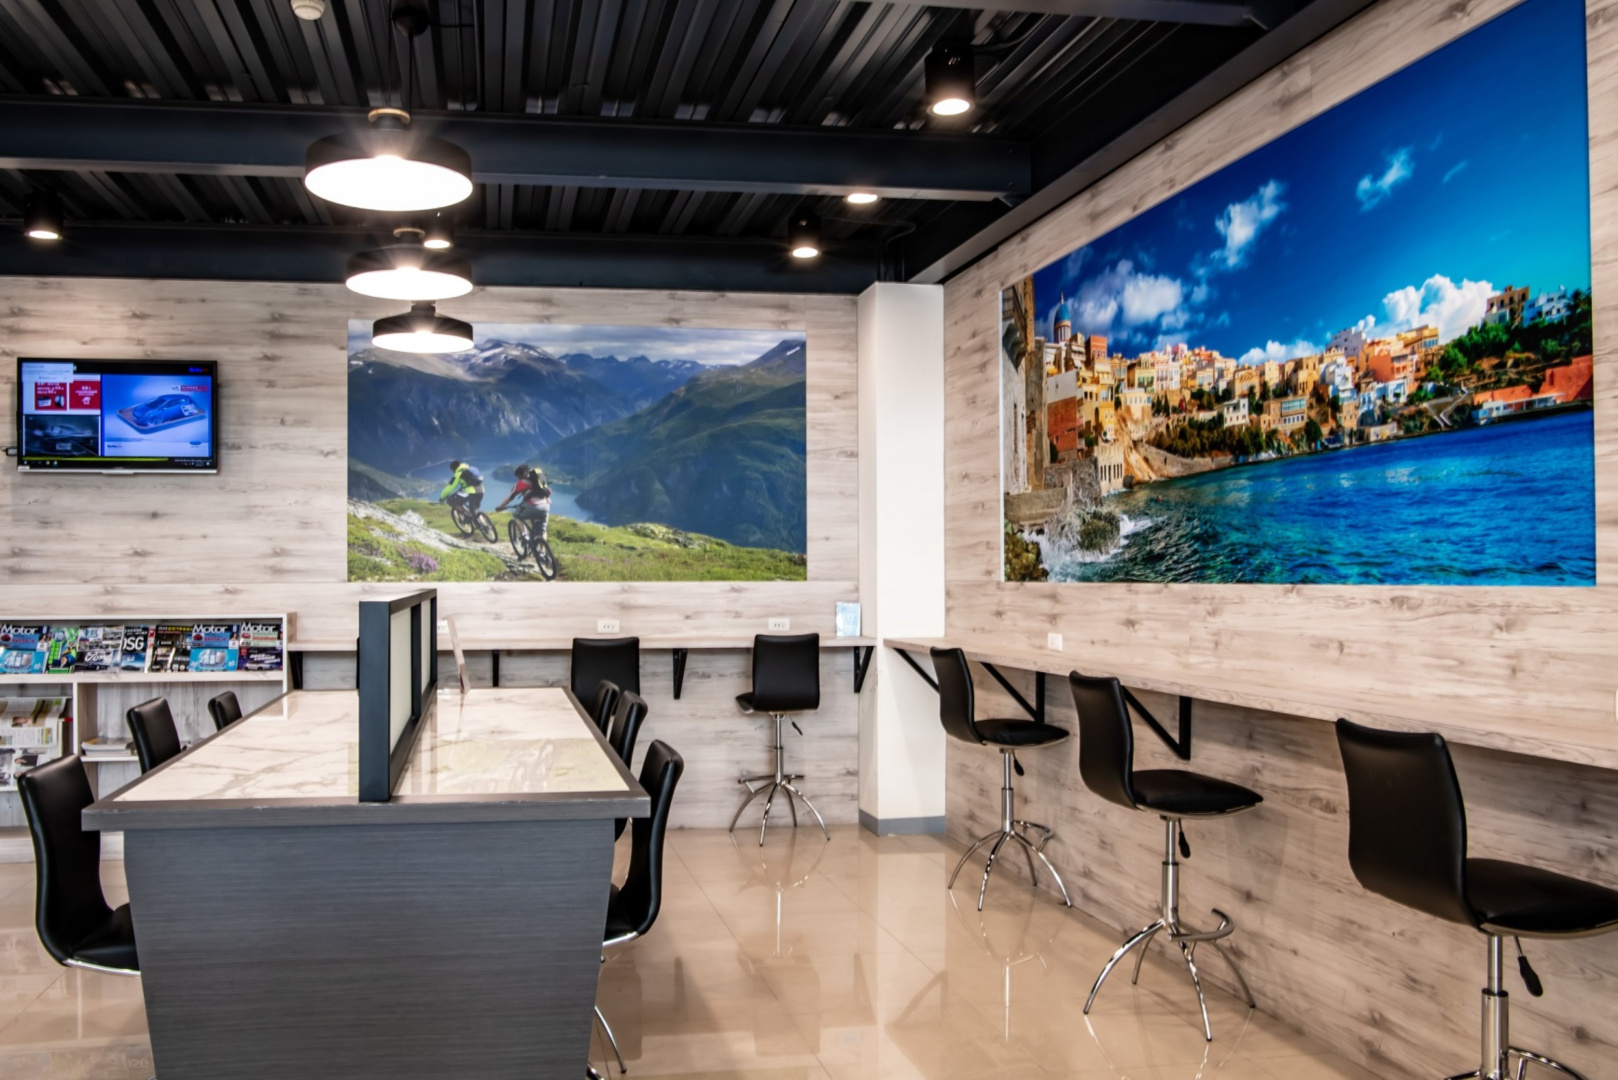 SMALL_【圖十一】Ford瑞特汽車嘉義據點嶄新的客休區提供明亮的休憩空間